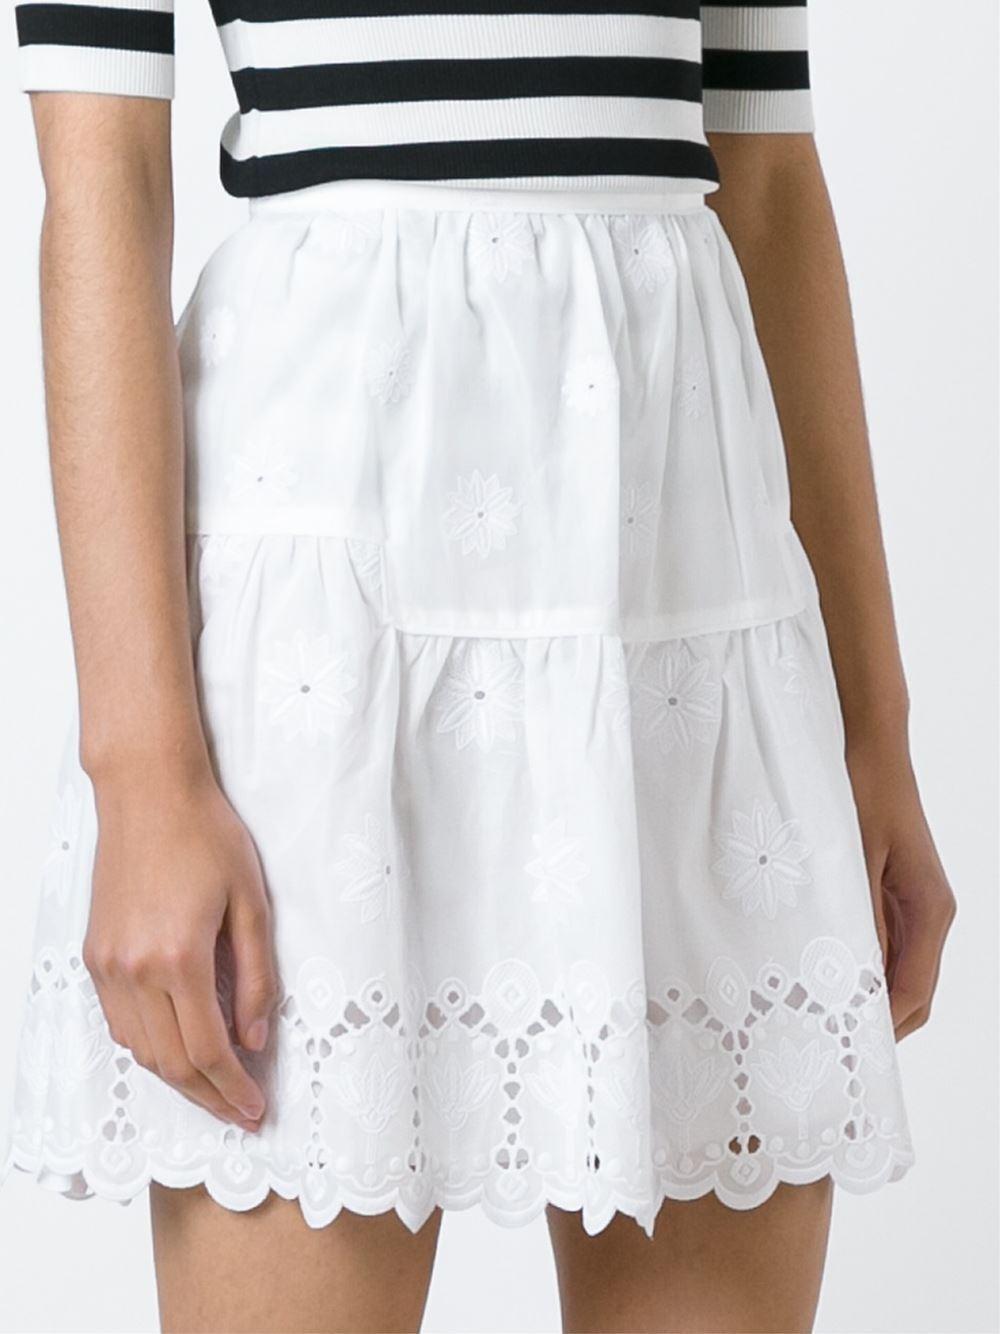 268 NEW Diane von Furstenberg DVF Sadey Cotton Eyelet Full Mini Skirt White 2 4